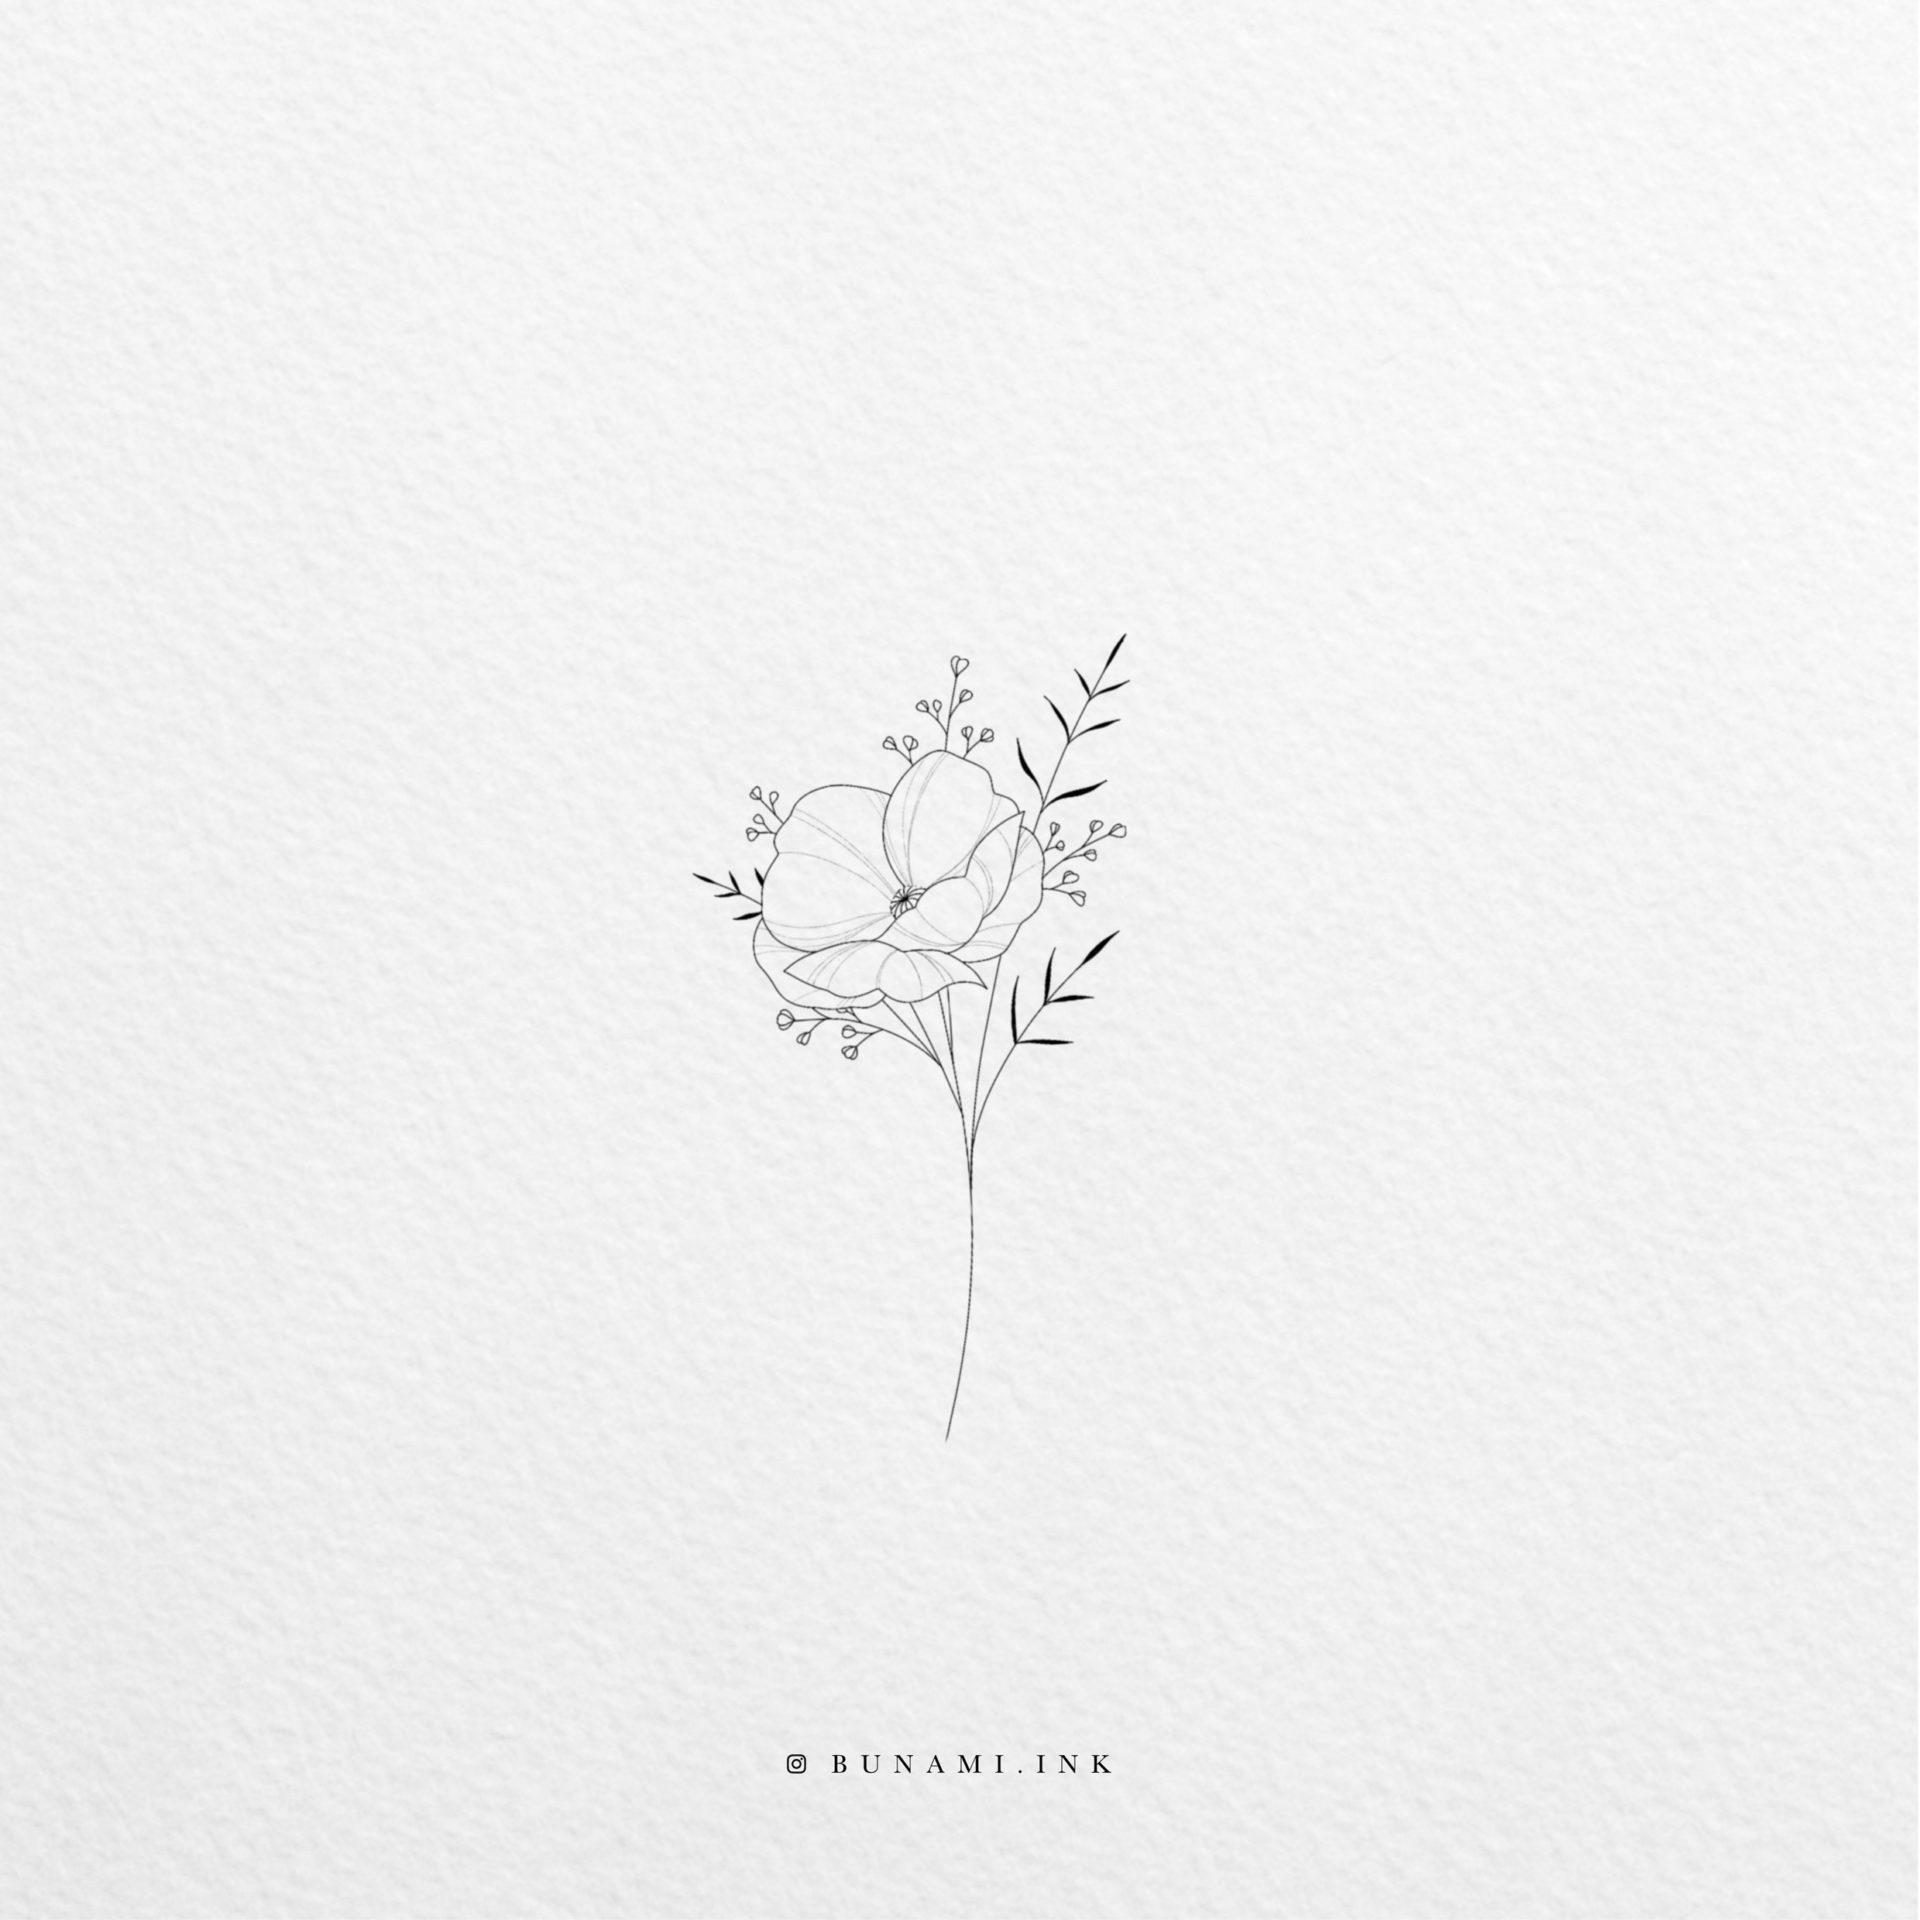 poppy-bouquet_2020-08-31